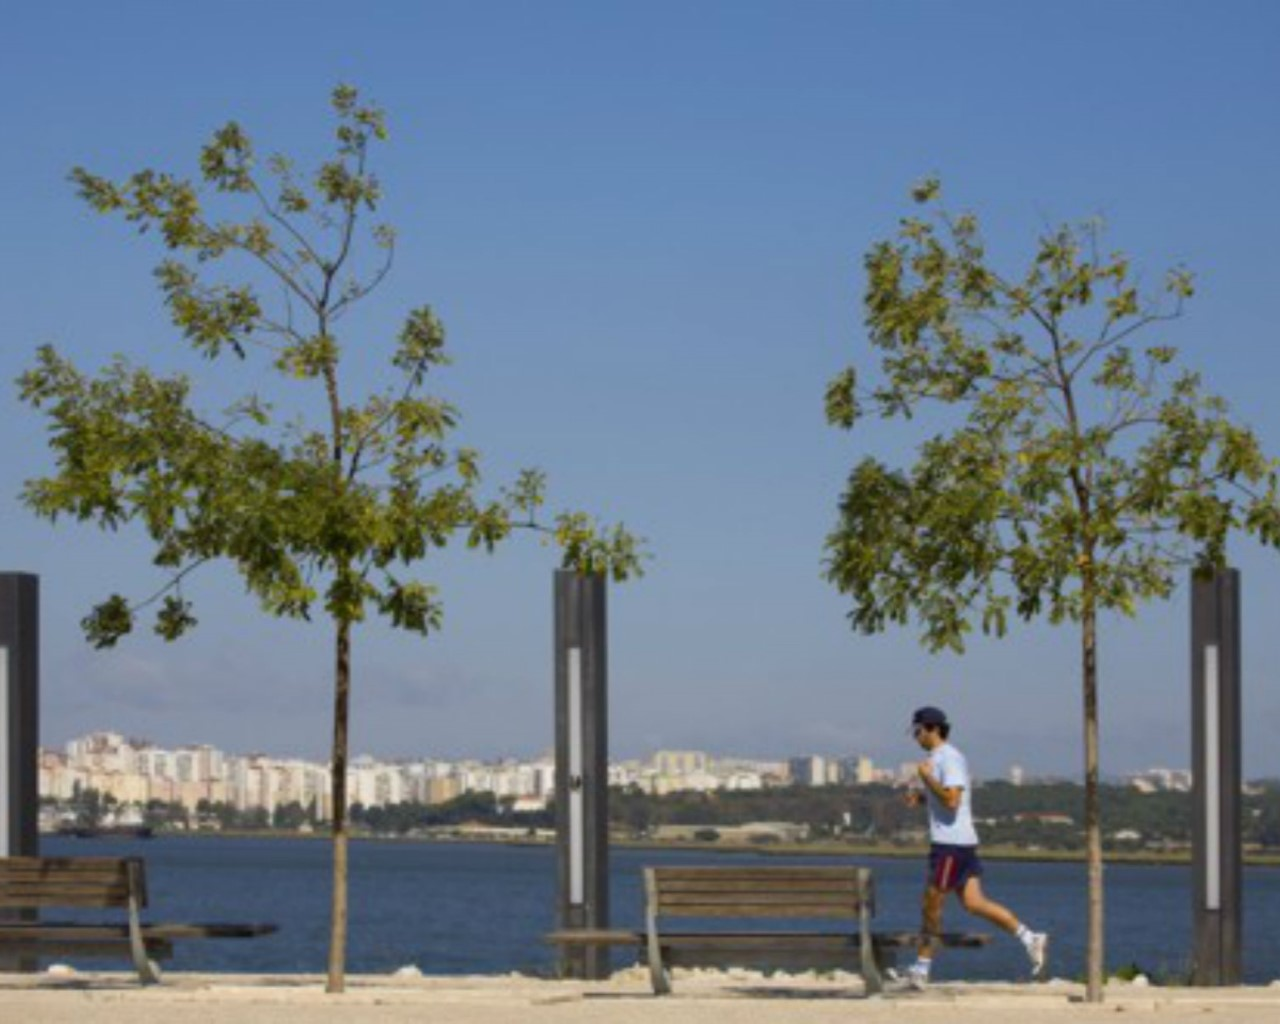 Promenade aménagée Seixal